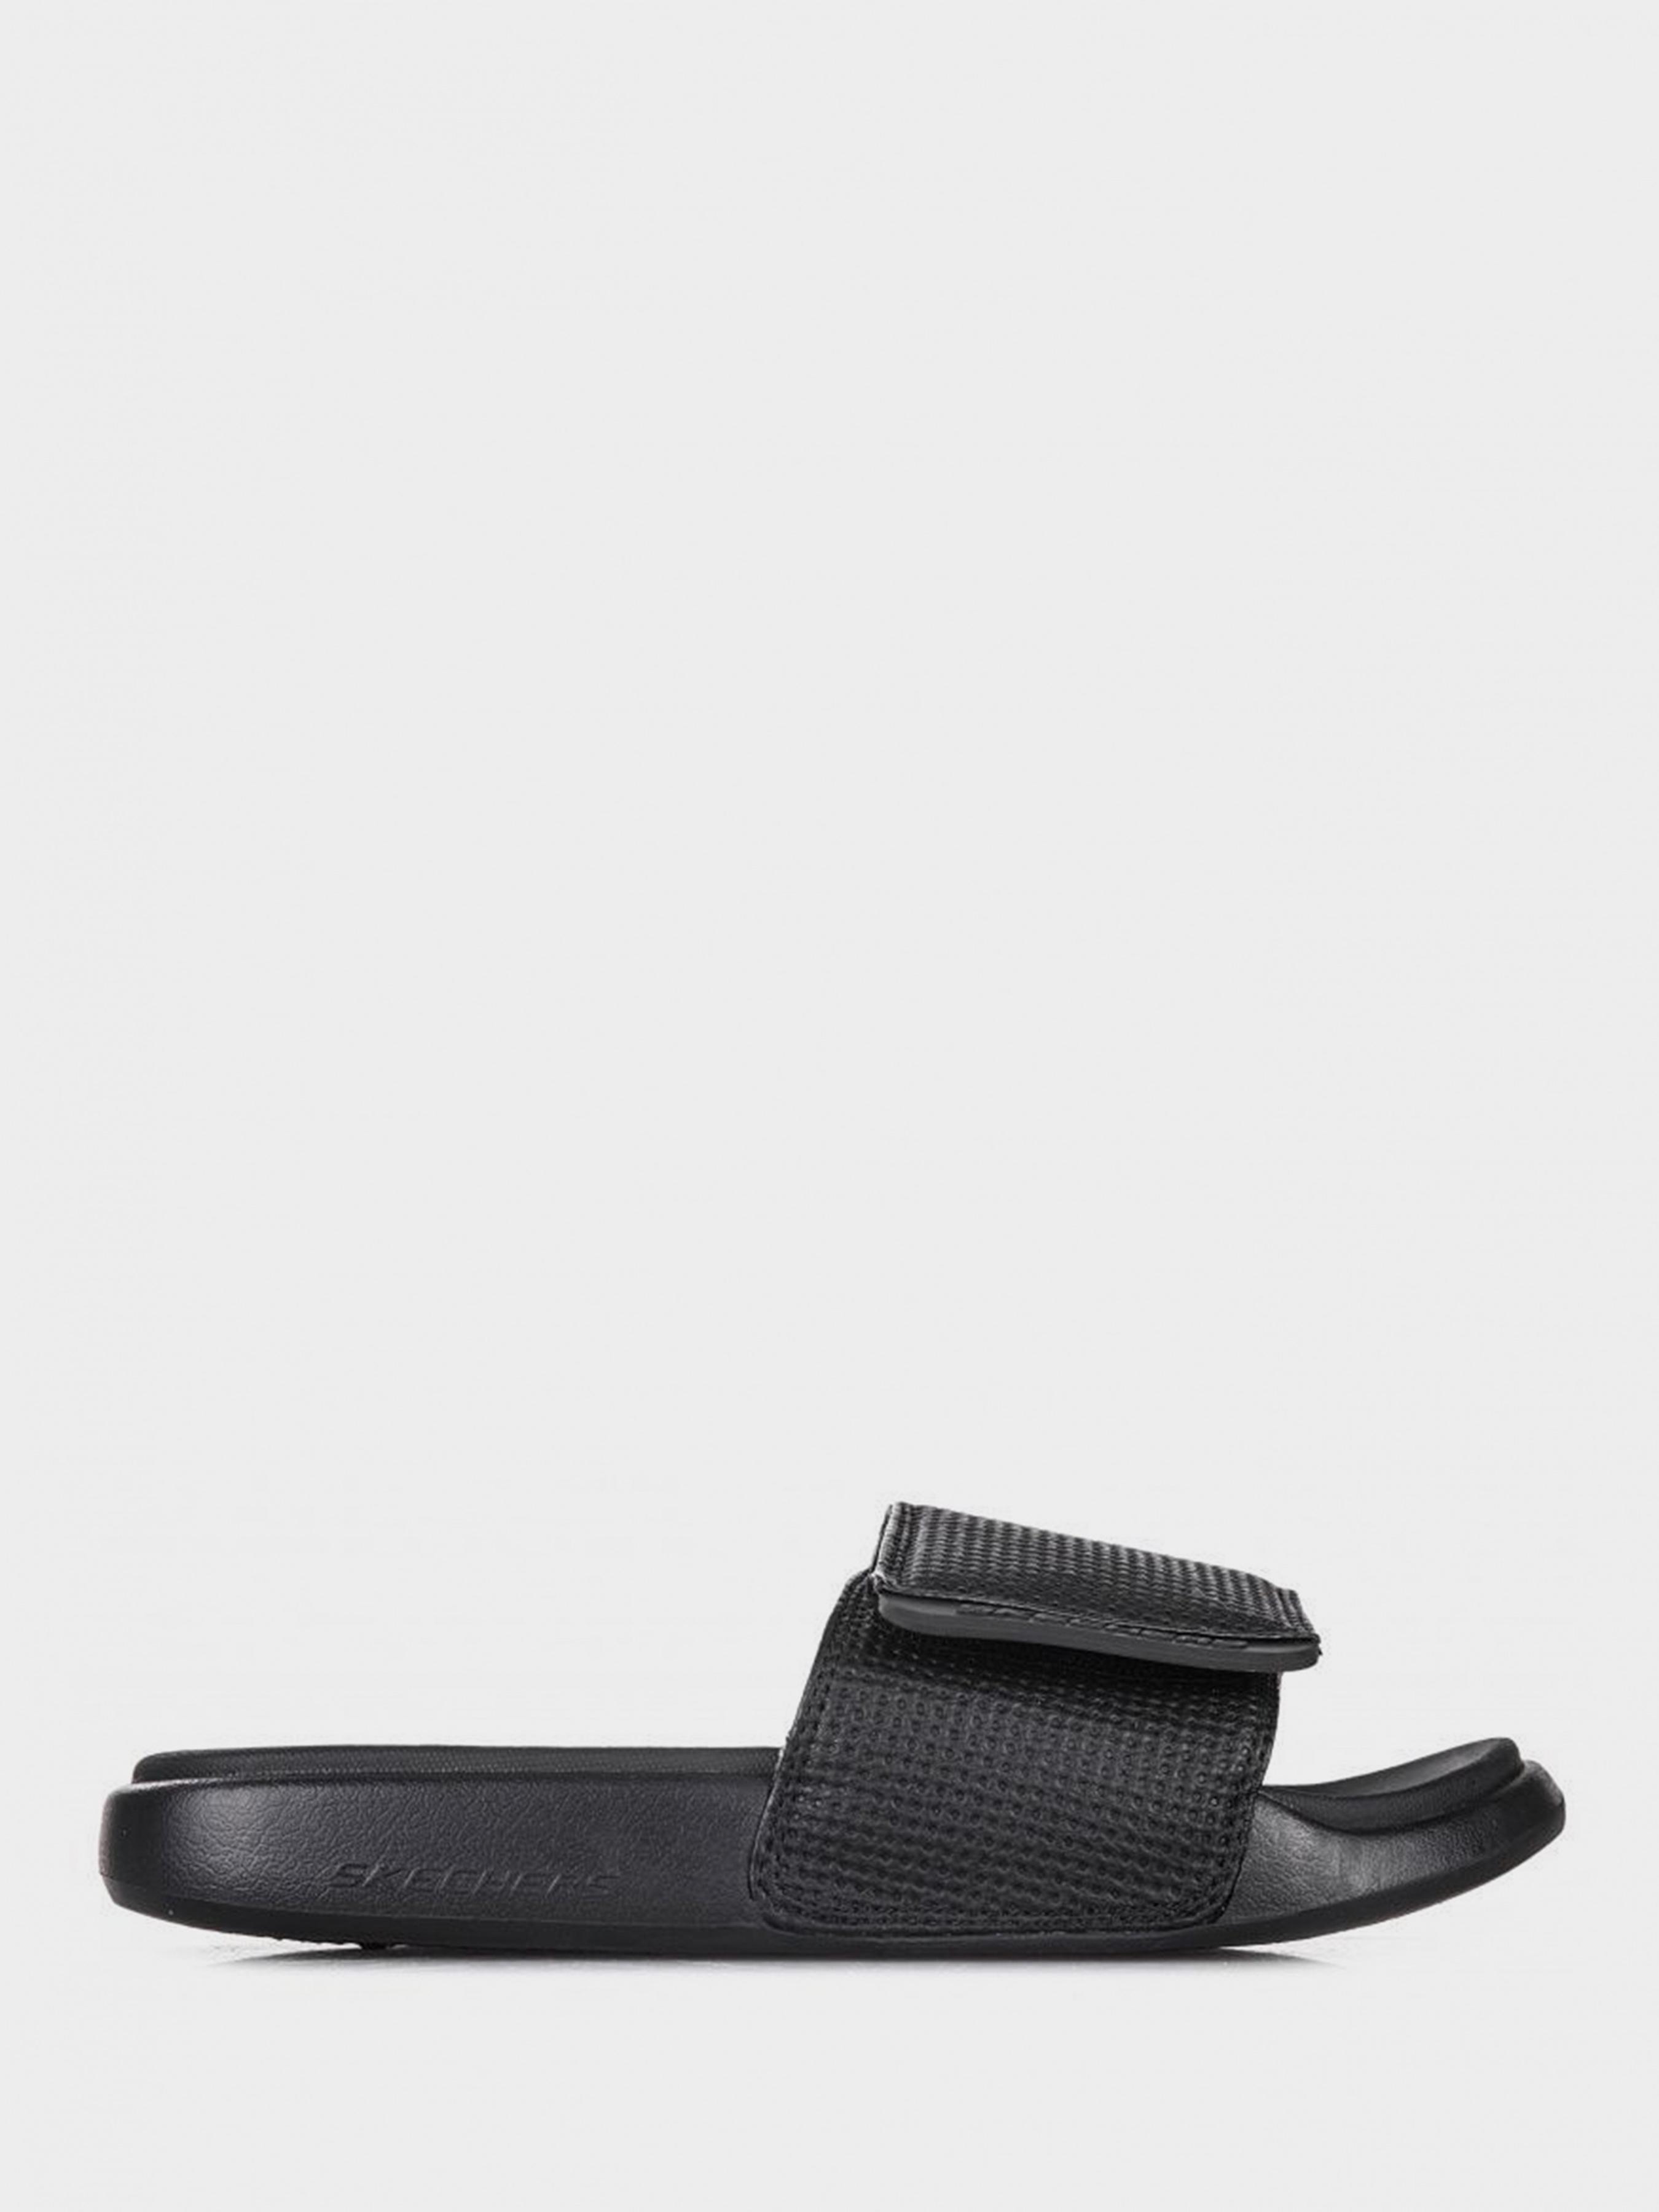 Шлёпанцы для мужчин Skechers KM3124 размеры обуви, 2017